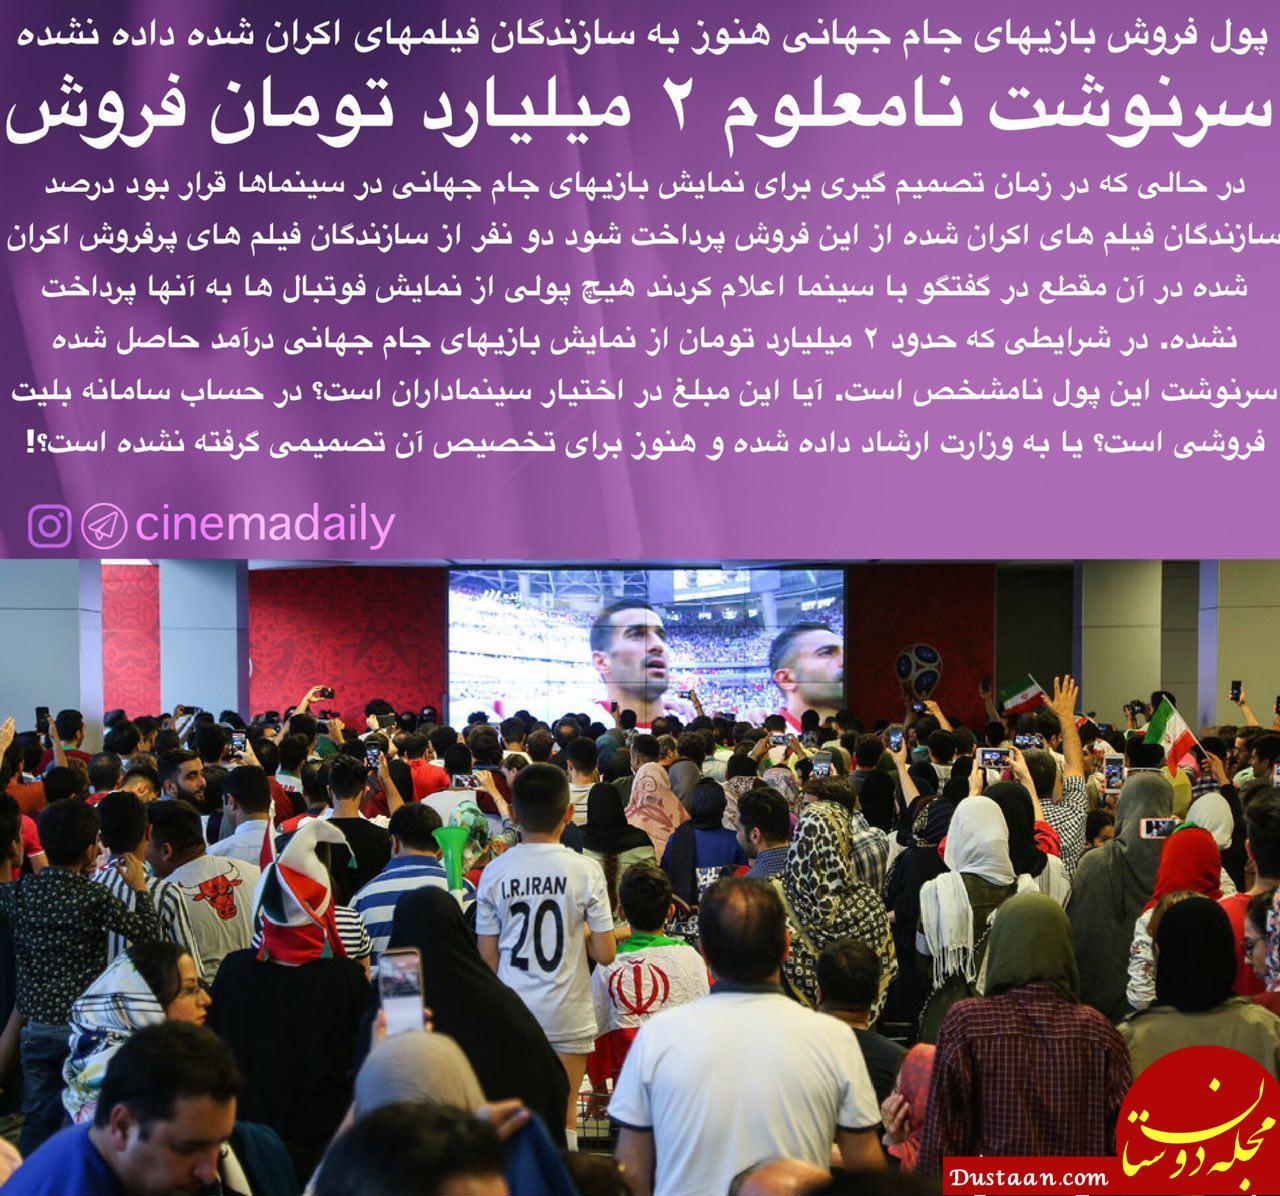 www.dustaan.com سرنوشت نامعلوم 2 میلیارد تومان فروش فوتبال! +عکس